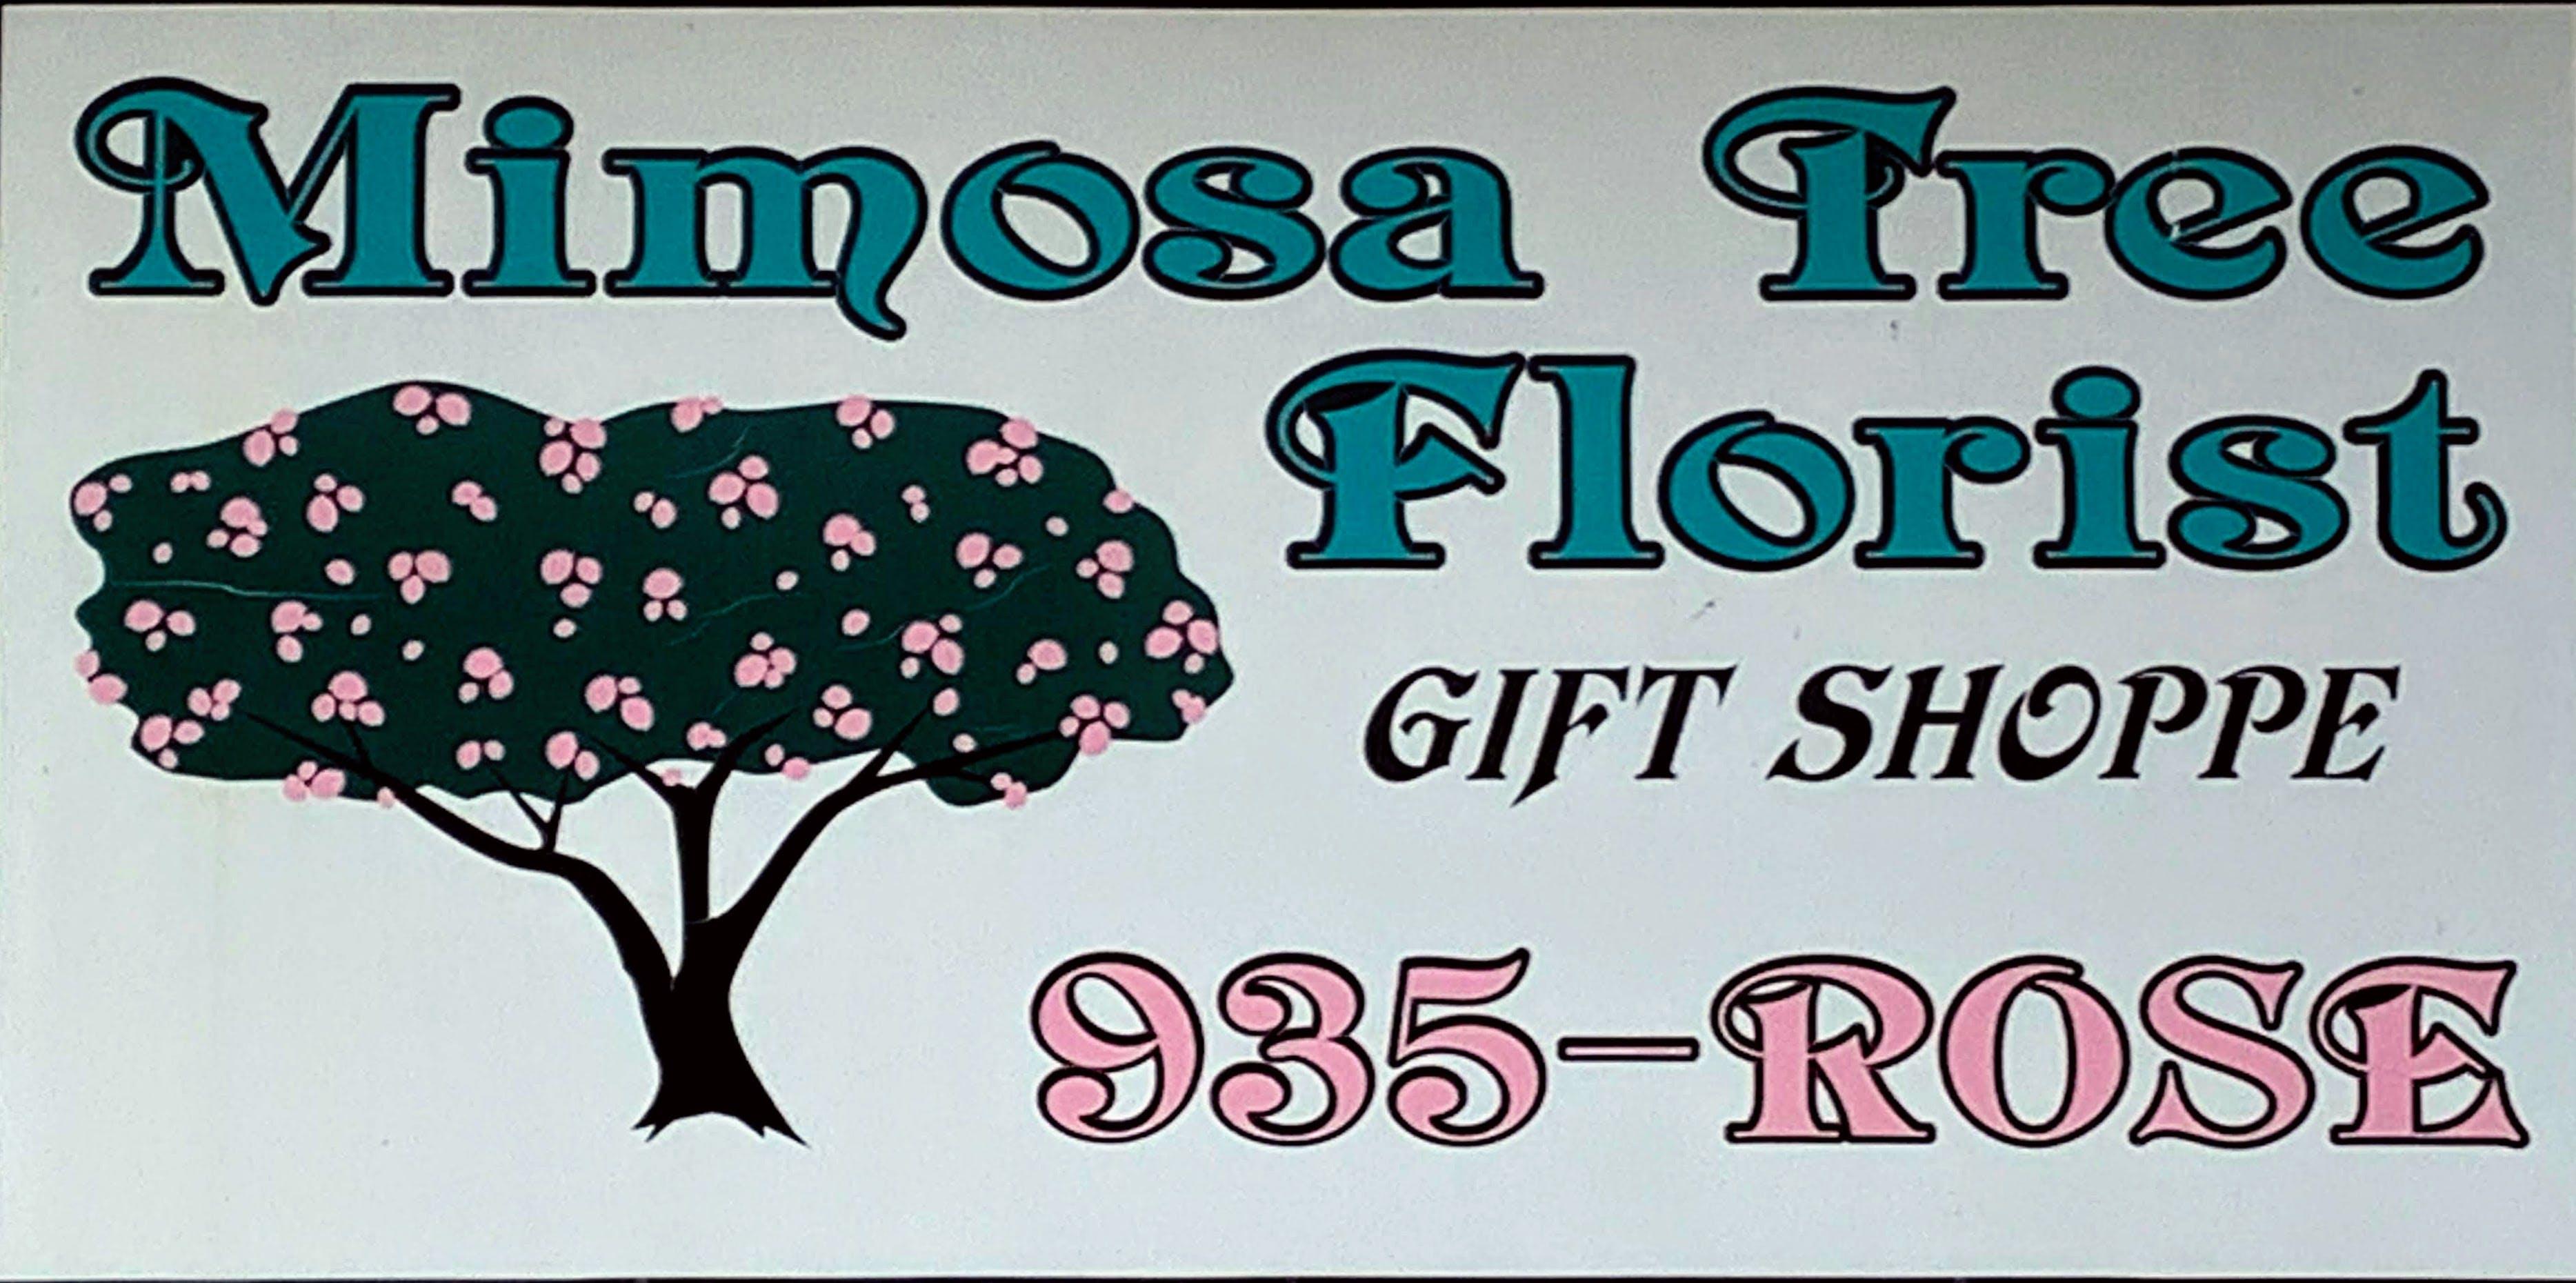 The Mimosa Tree Florist